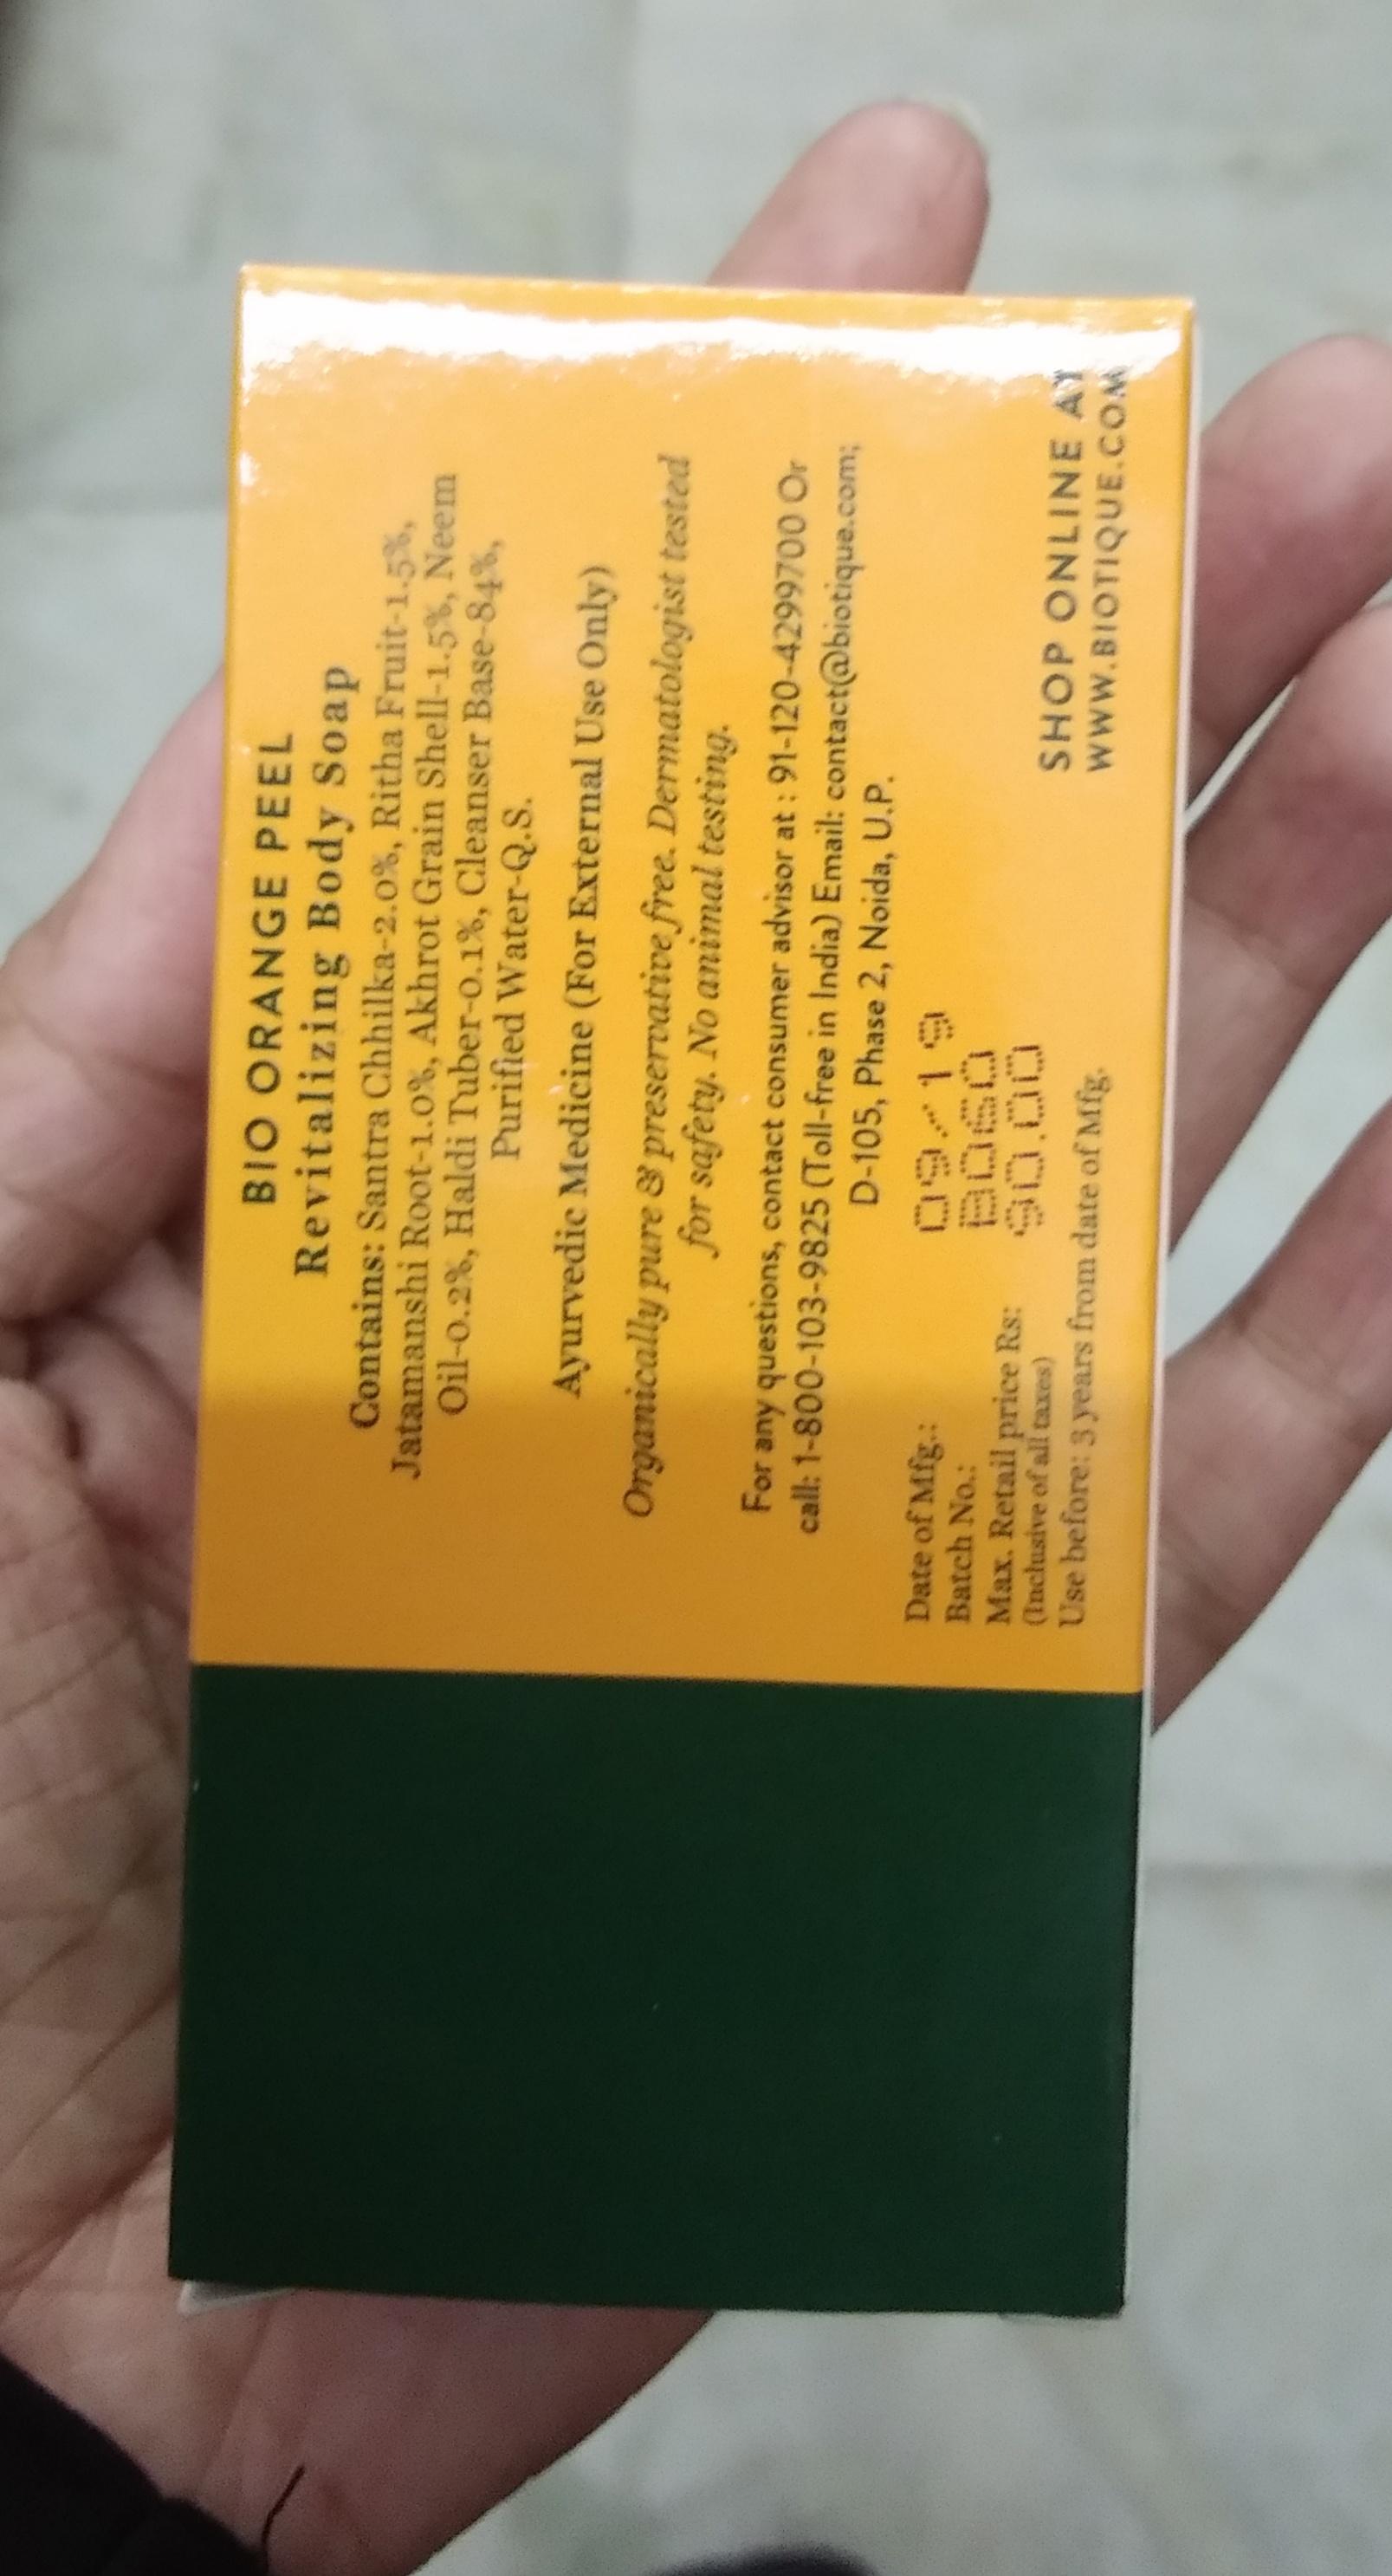 Biotique Bio Orange Peel Body Revitalizing Body Soap pic 2-A scrub soap-By Nasreen